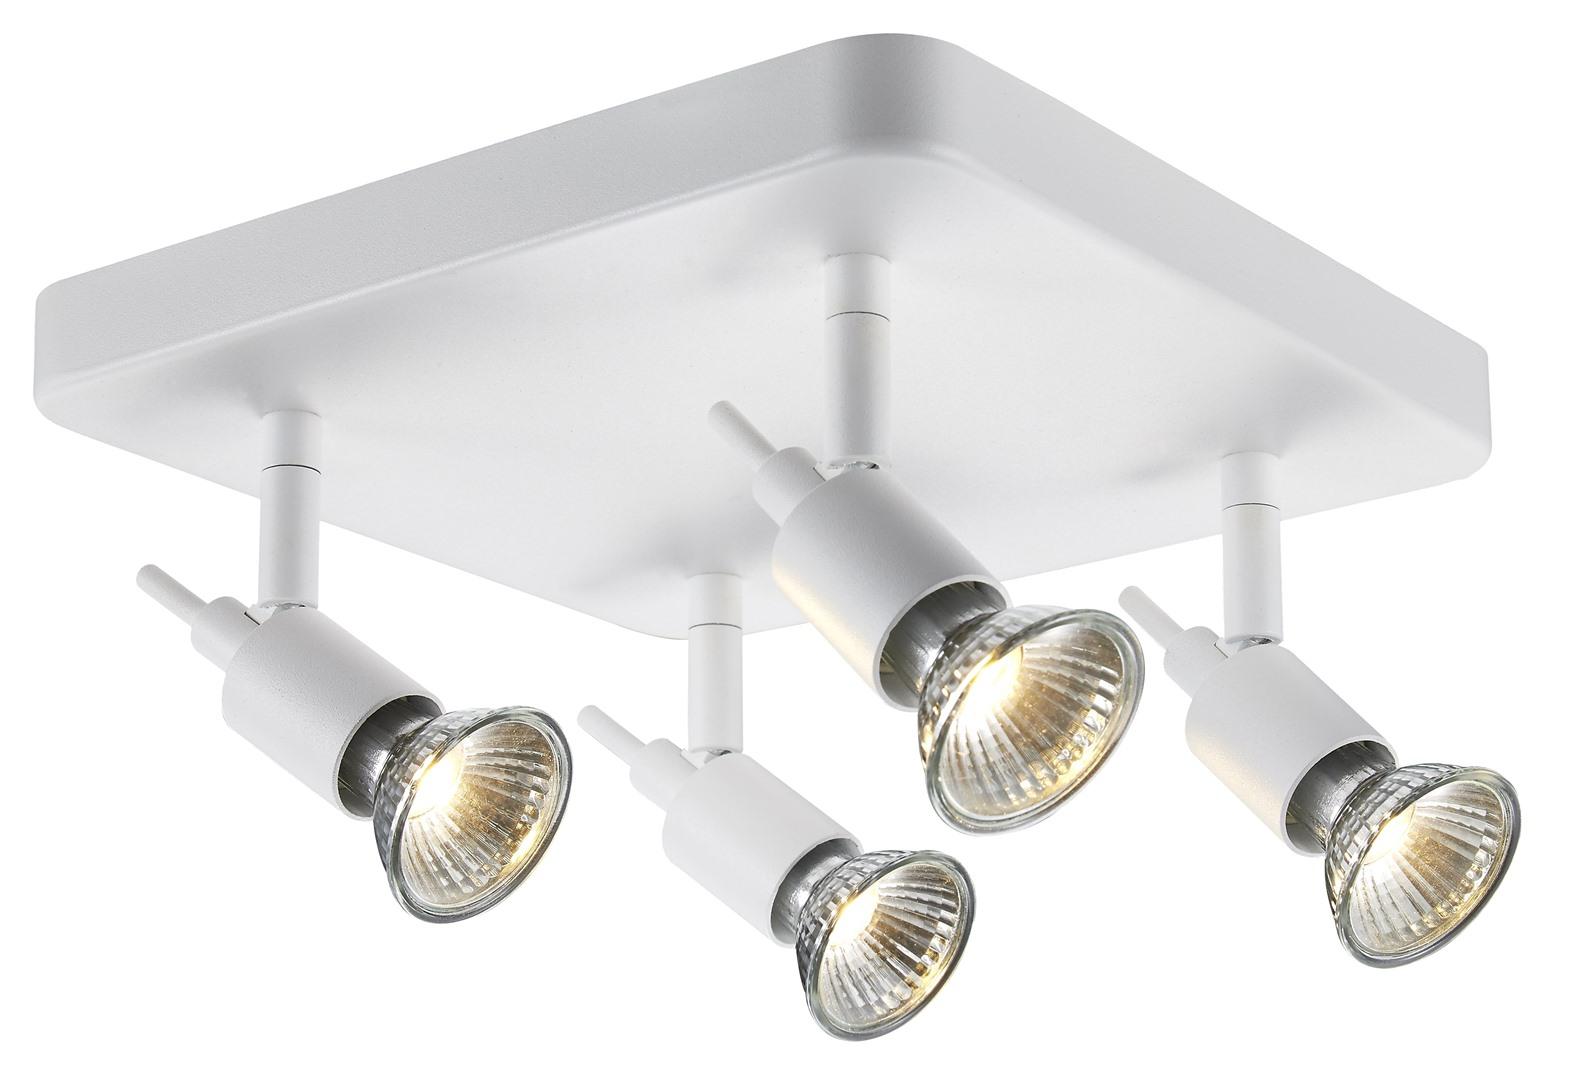 Plafondlamp spot wit led dimbaar krea